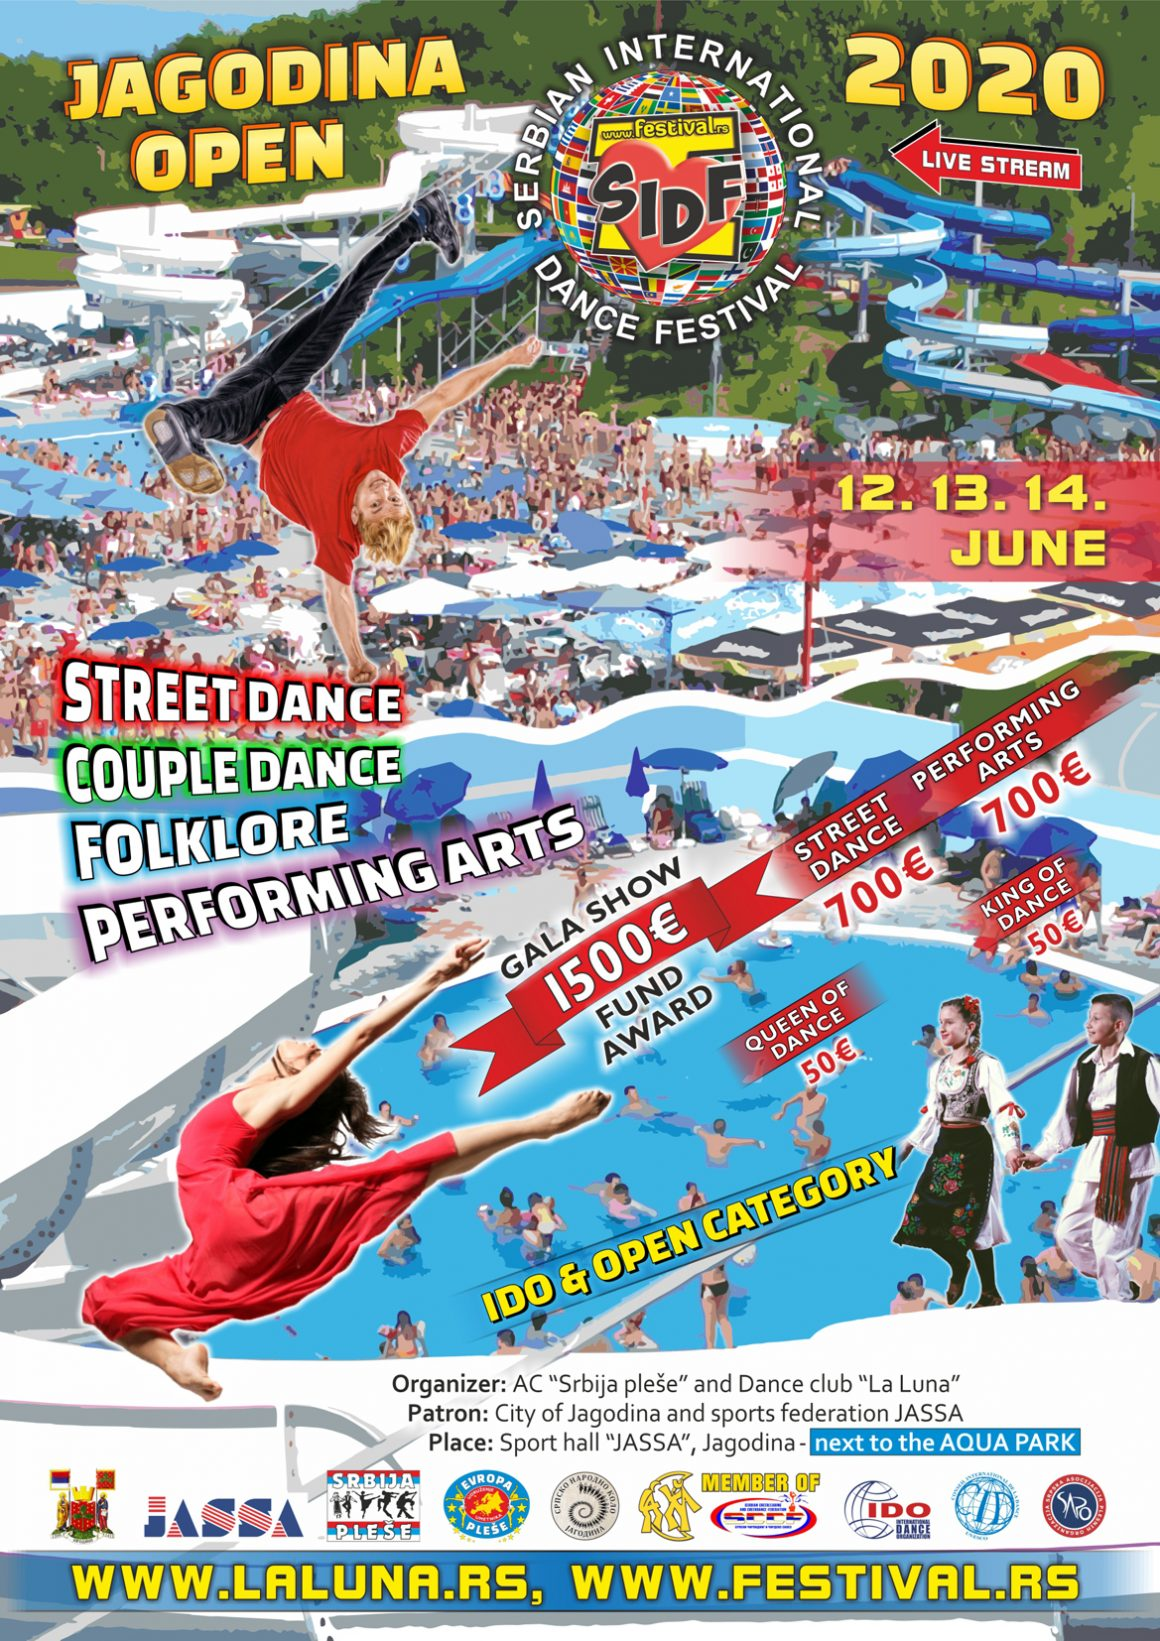 Jagodina Open 13. – 14. jun 2020.